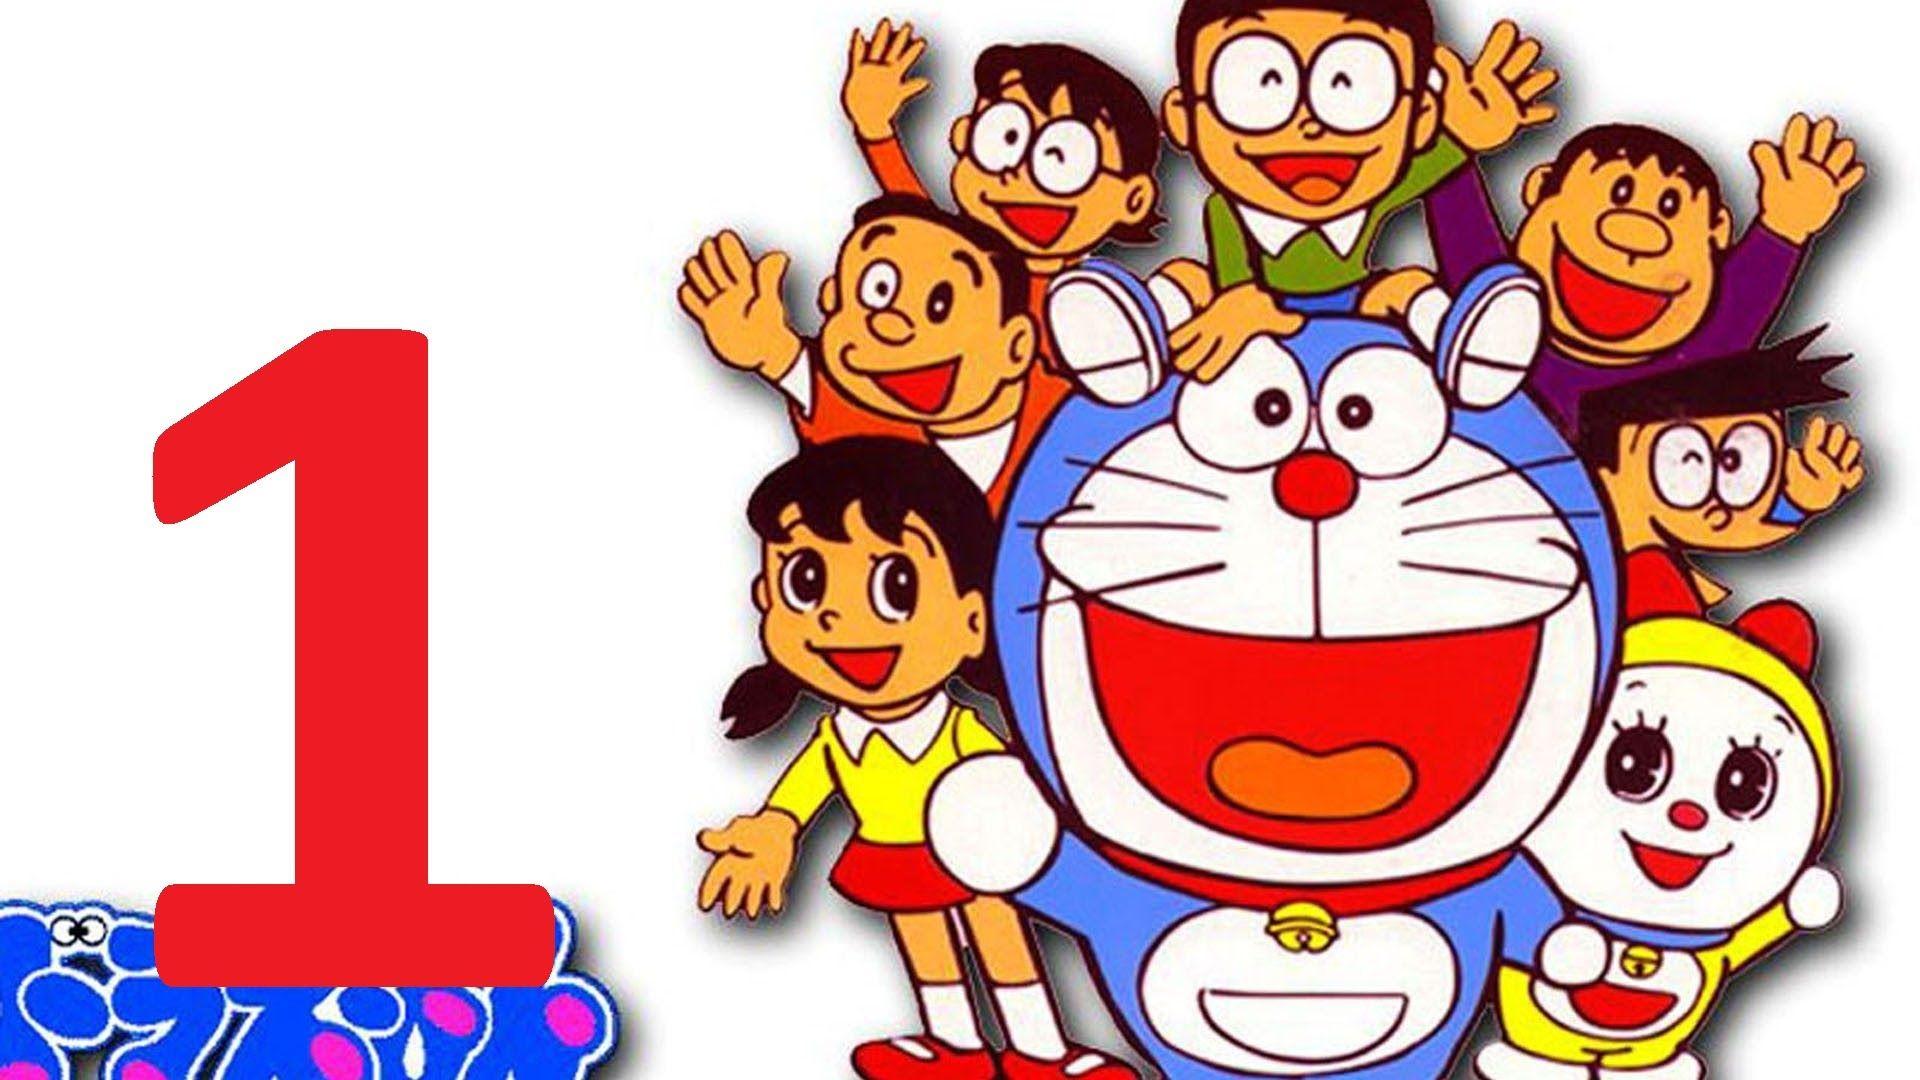 DOREMON TIẾNG VIỆT - Tổng hợp Doremon lồng tiếng phần mới -Tập 1 | Doraemon  wallpapers, Character wallpaper, Cartoon wallpaper